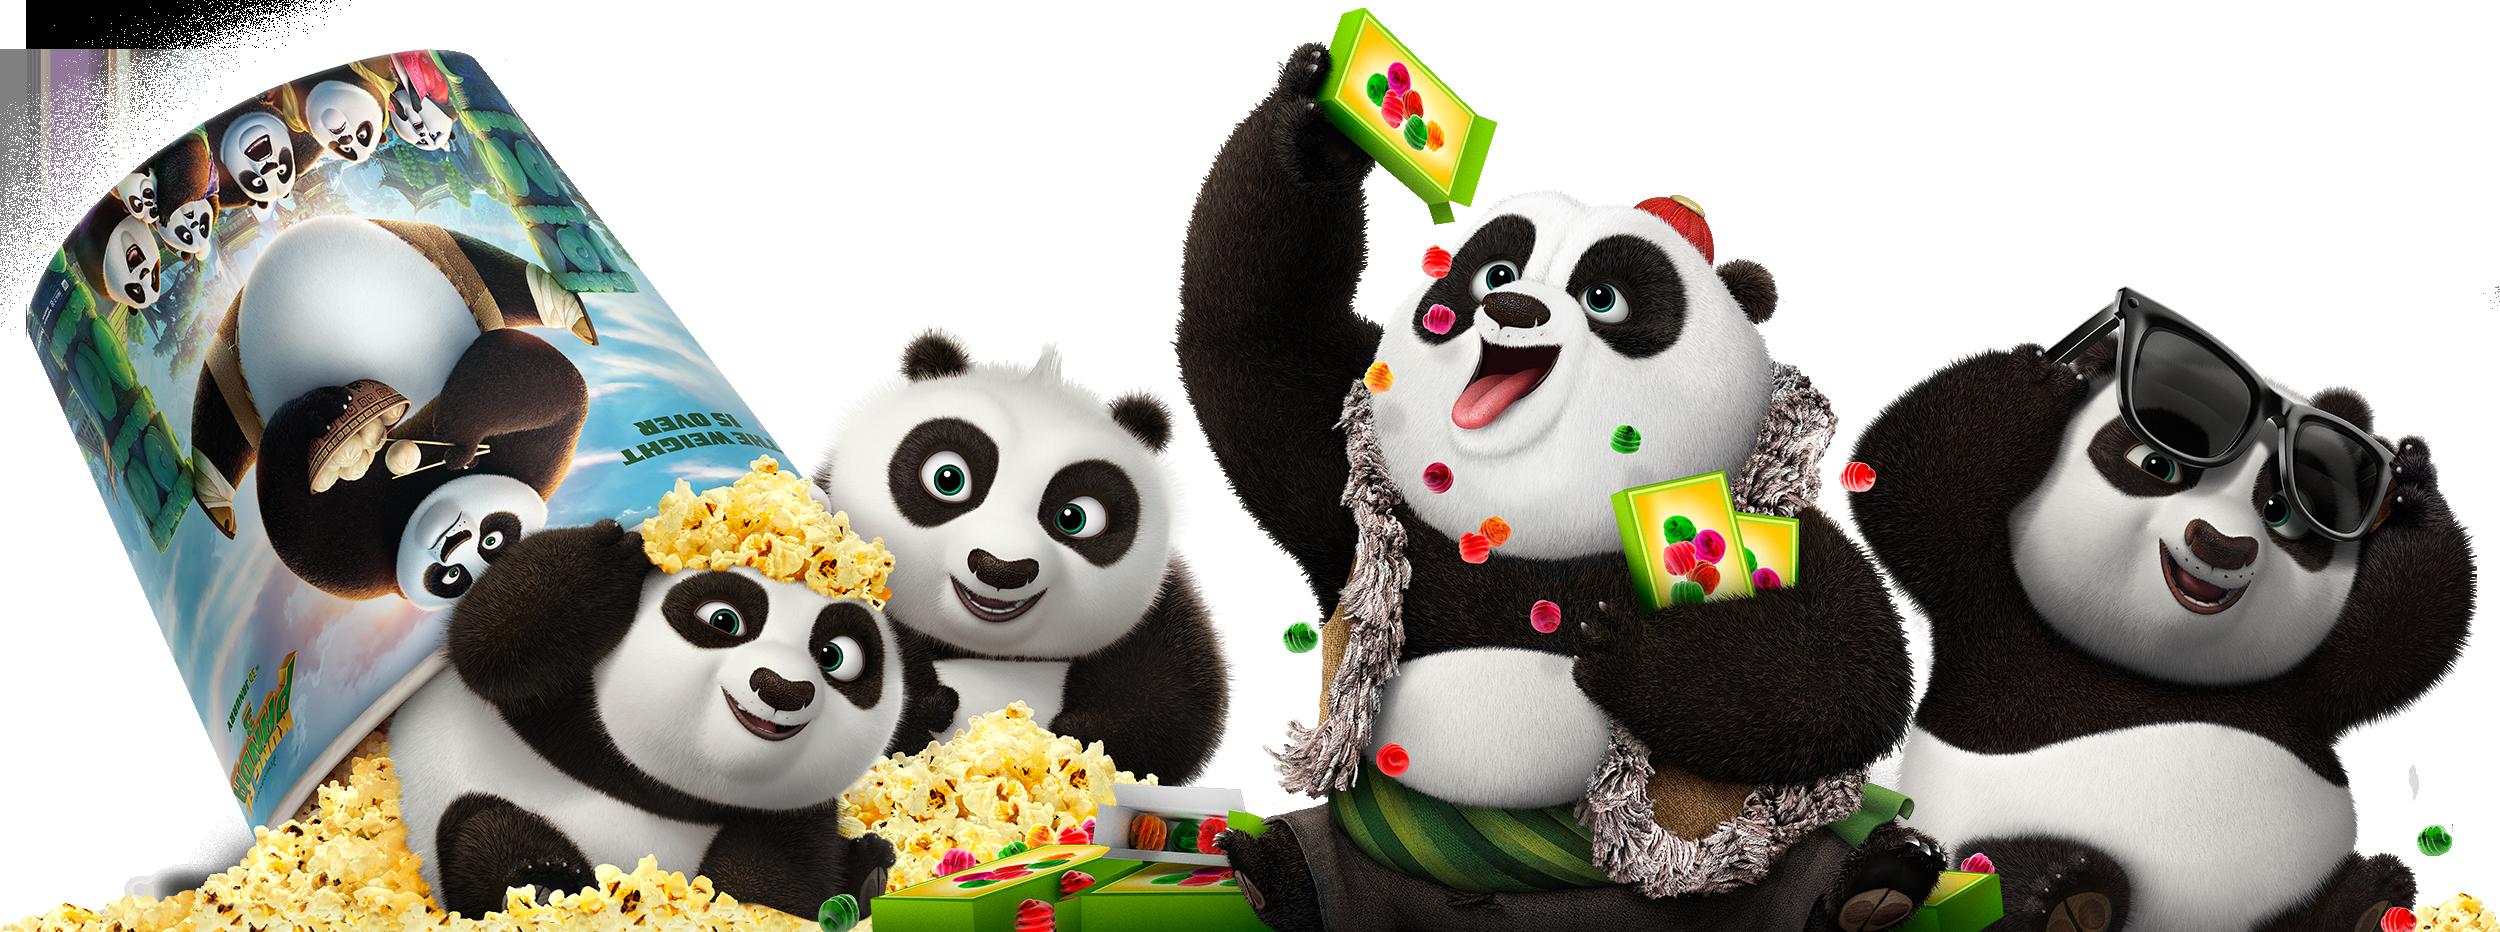 Kung Fu Panda 3 | Clings Finishing & Illustration